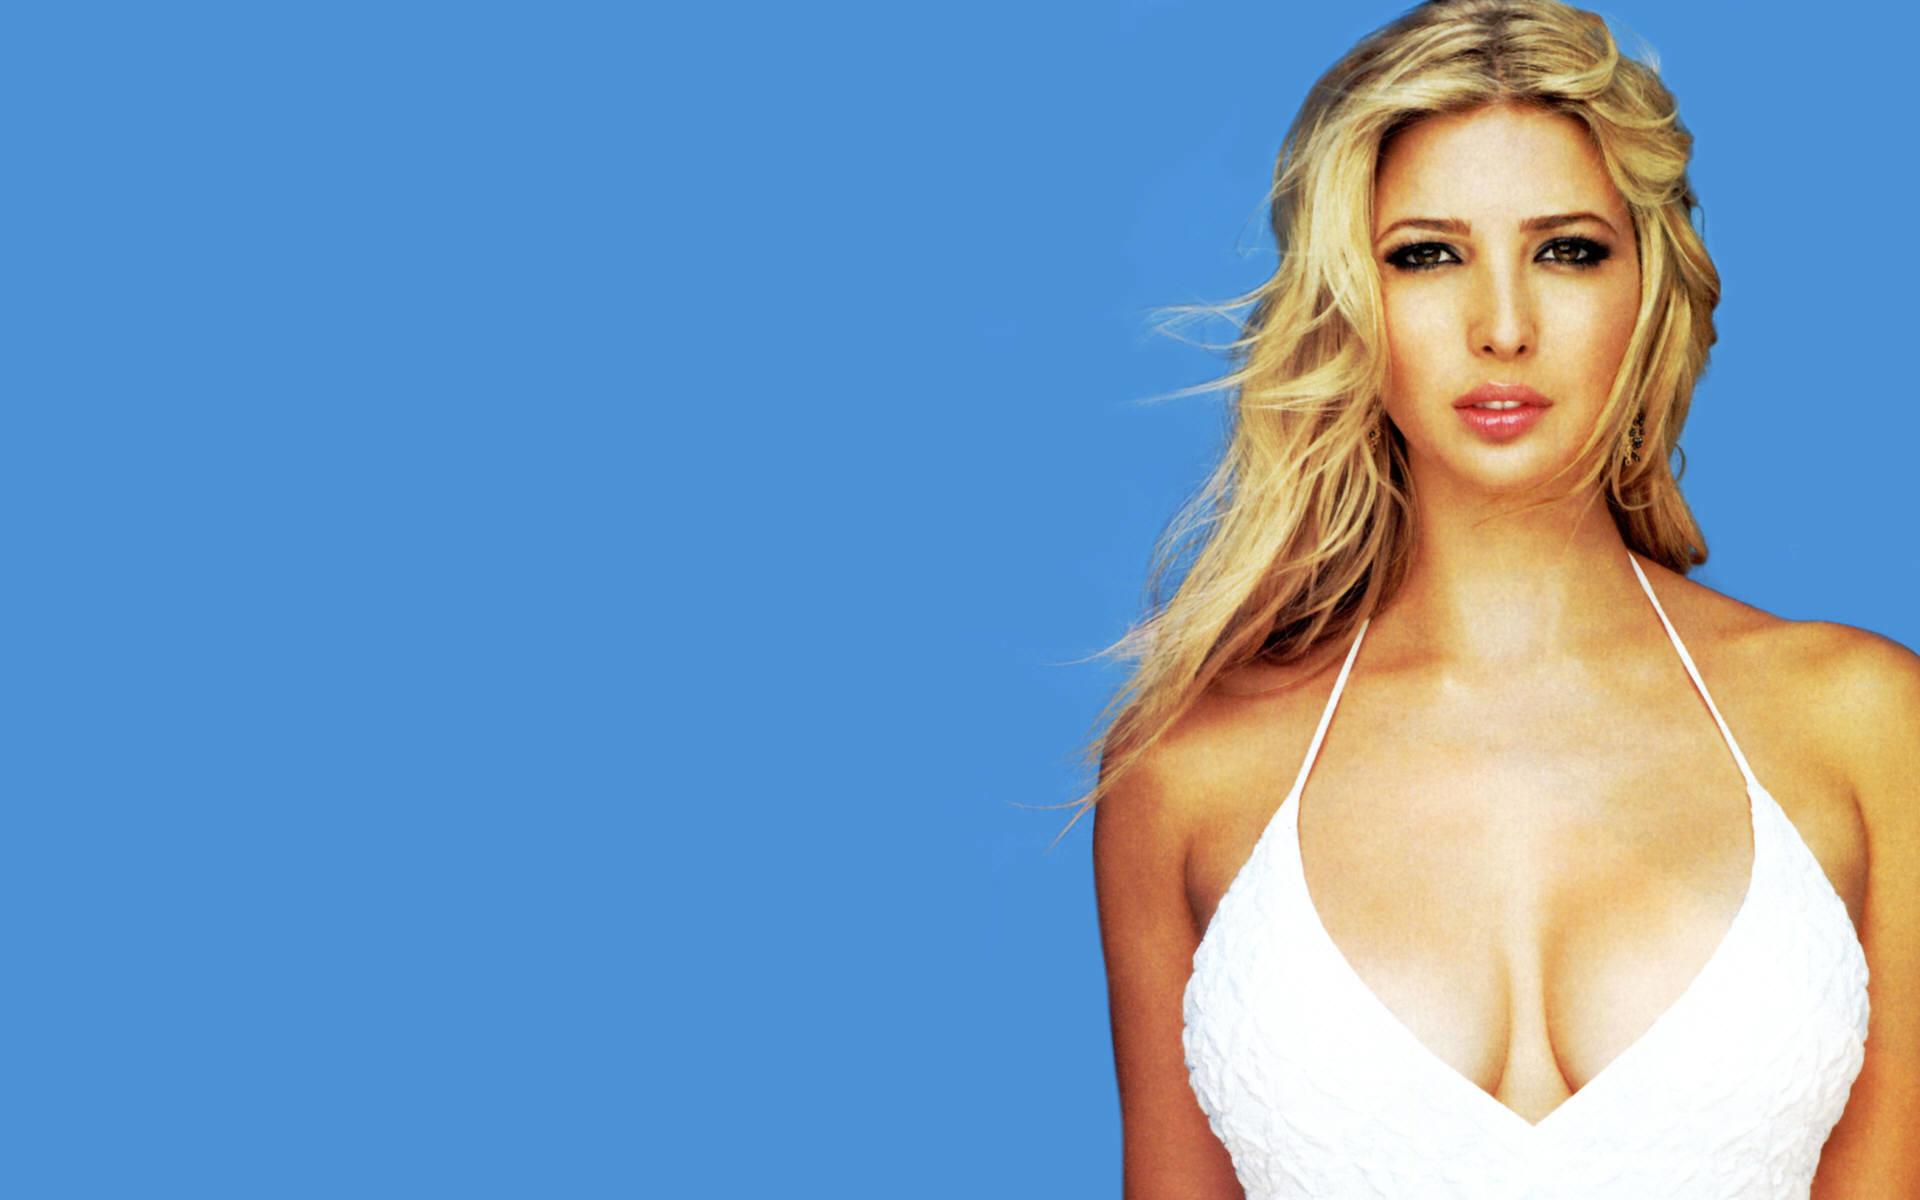 Melania Trump 2013 Wallpaper » Melania Trump 2013 Wallpaper